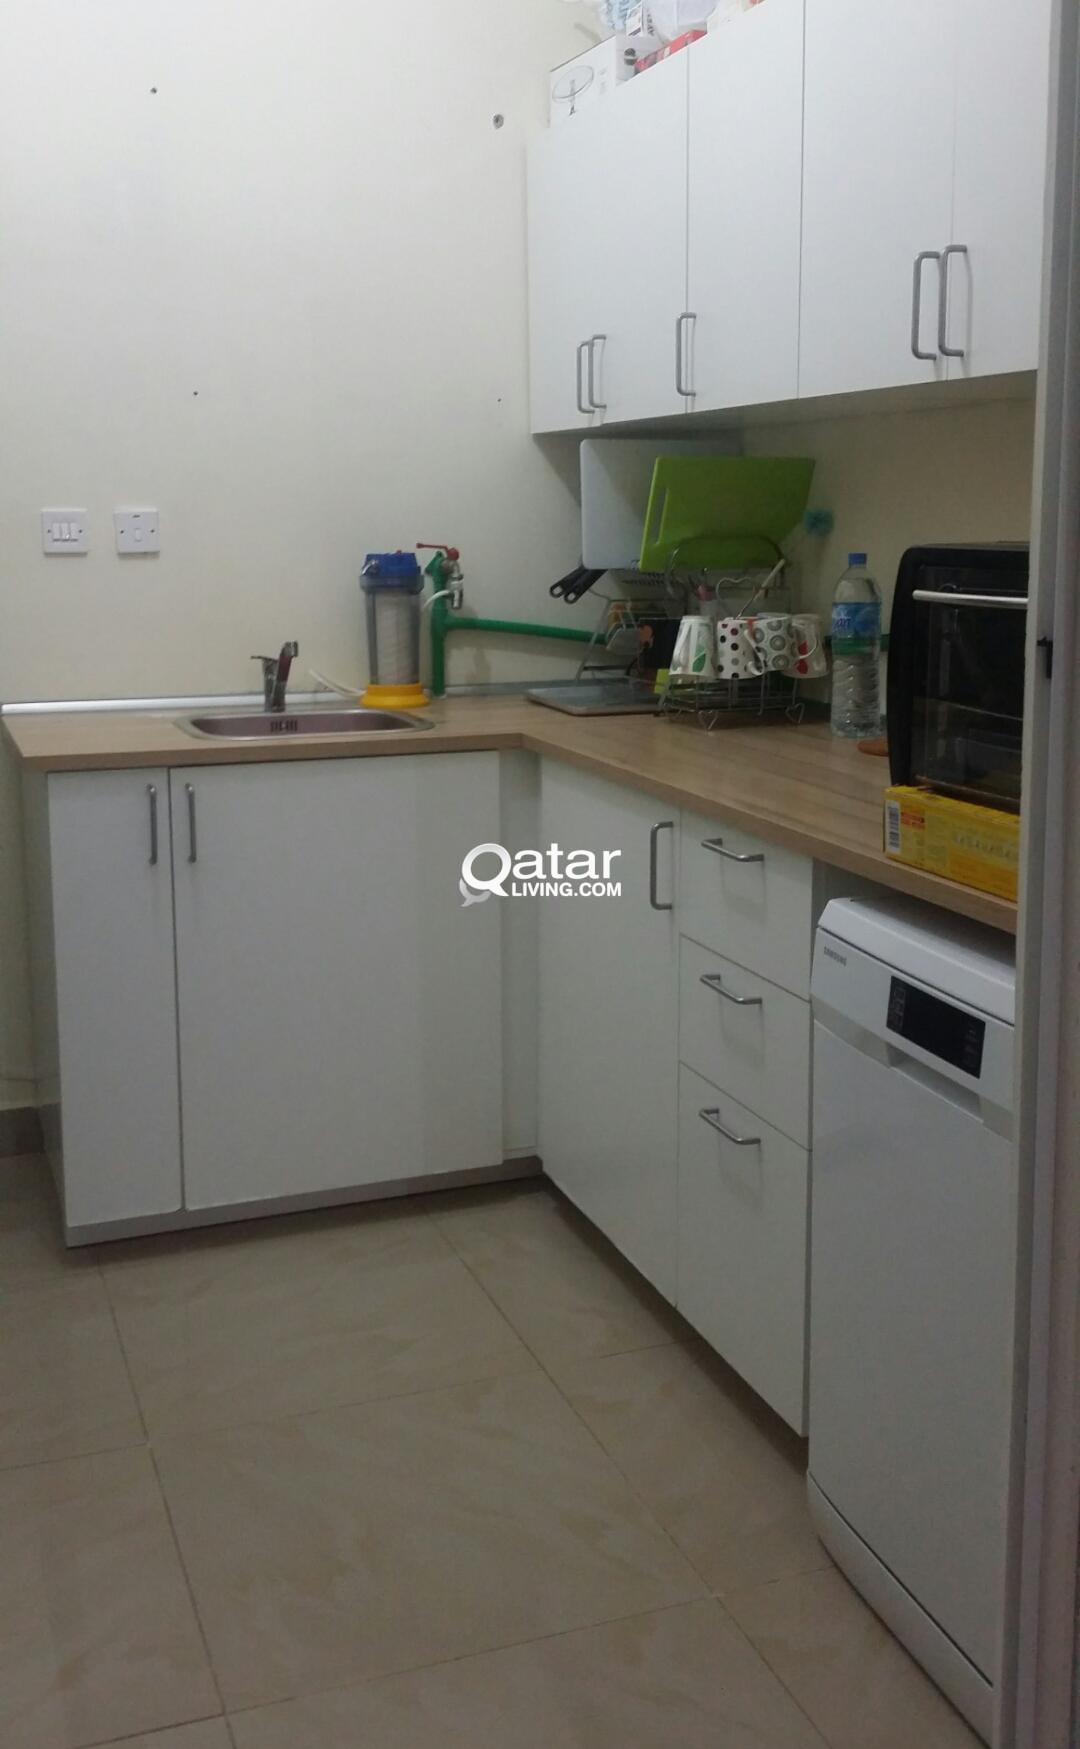 Ikea Qatar Kitchen Home And Aplliances